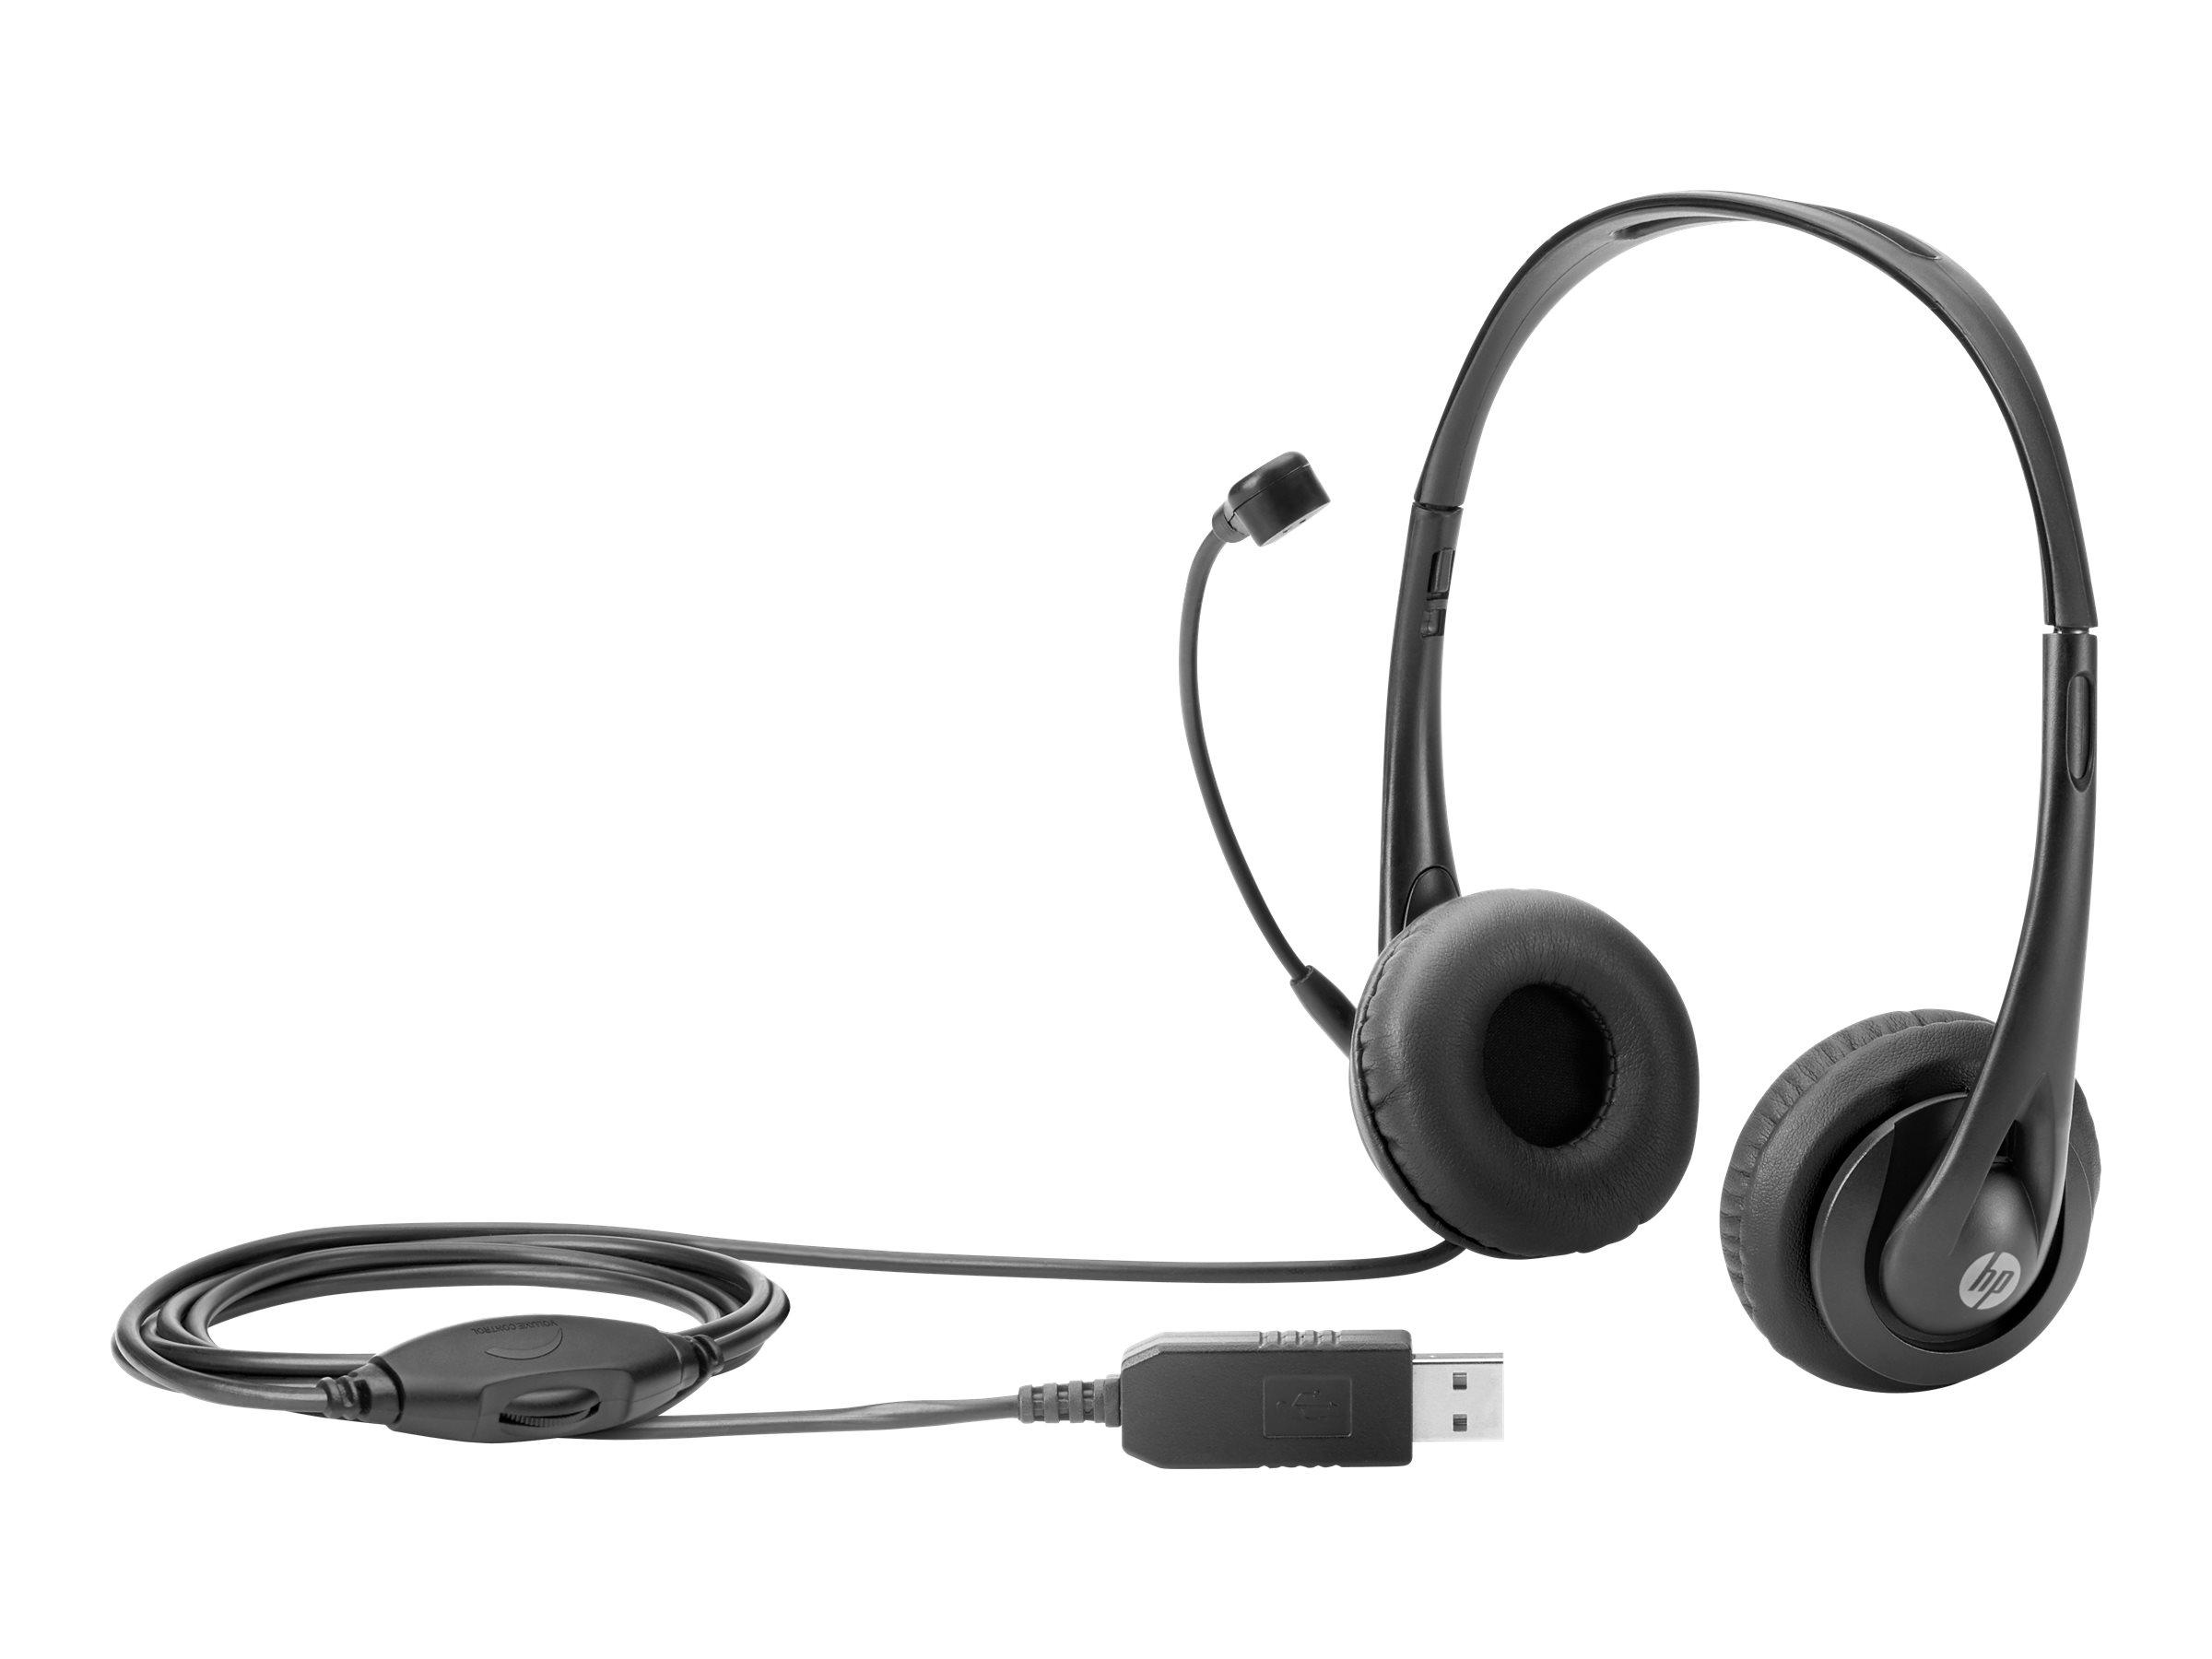 HP Headset - Black Jack - Stereo - On-Ear - kabelgebunden - USB